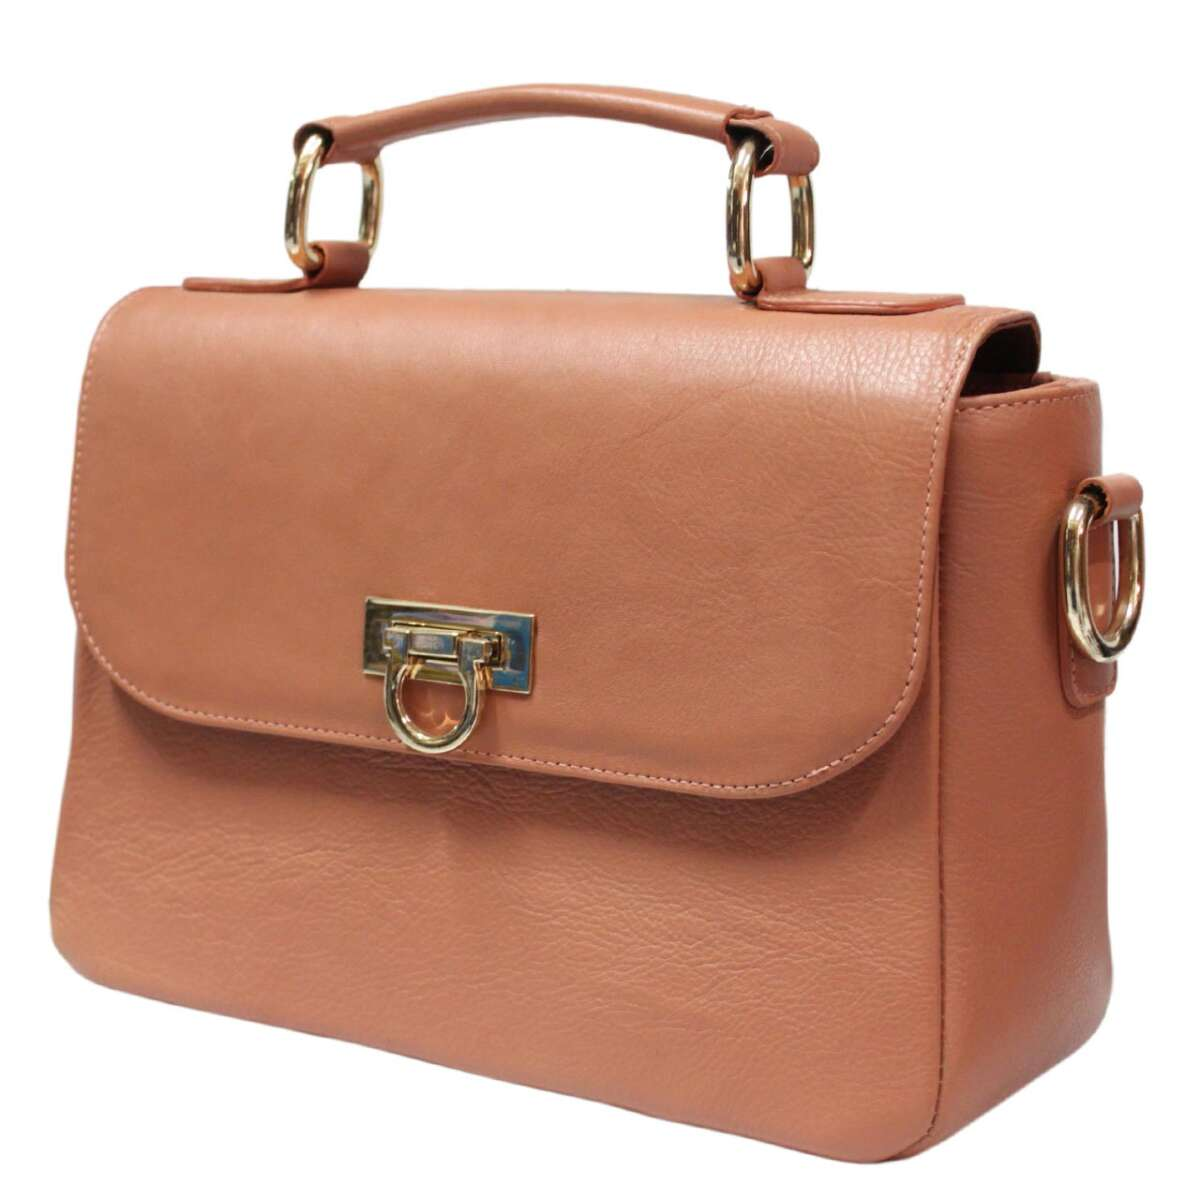 Túi xách nữ da bò B017b